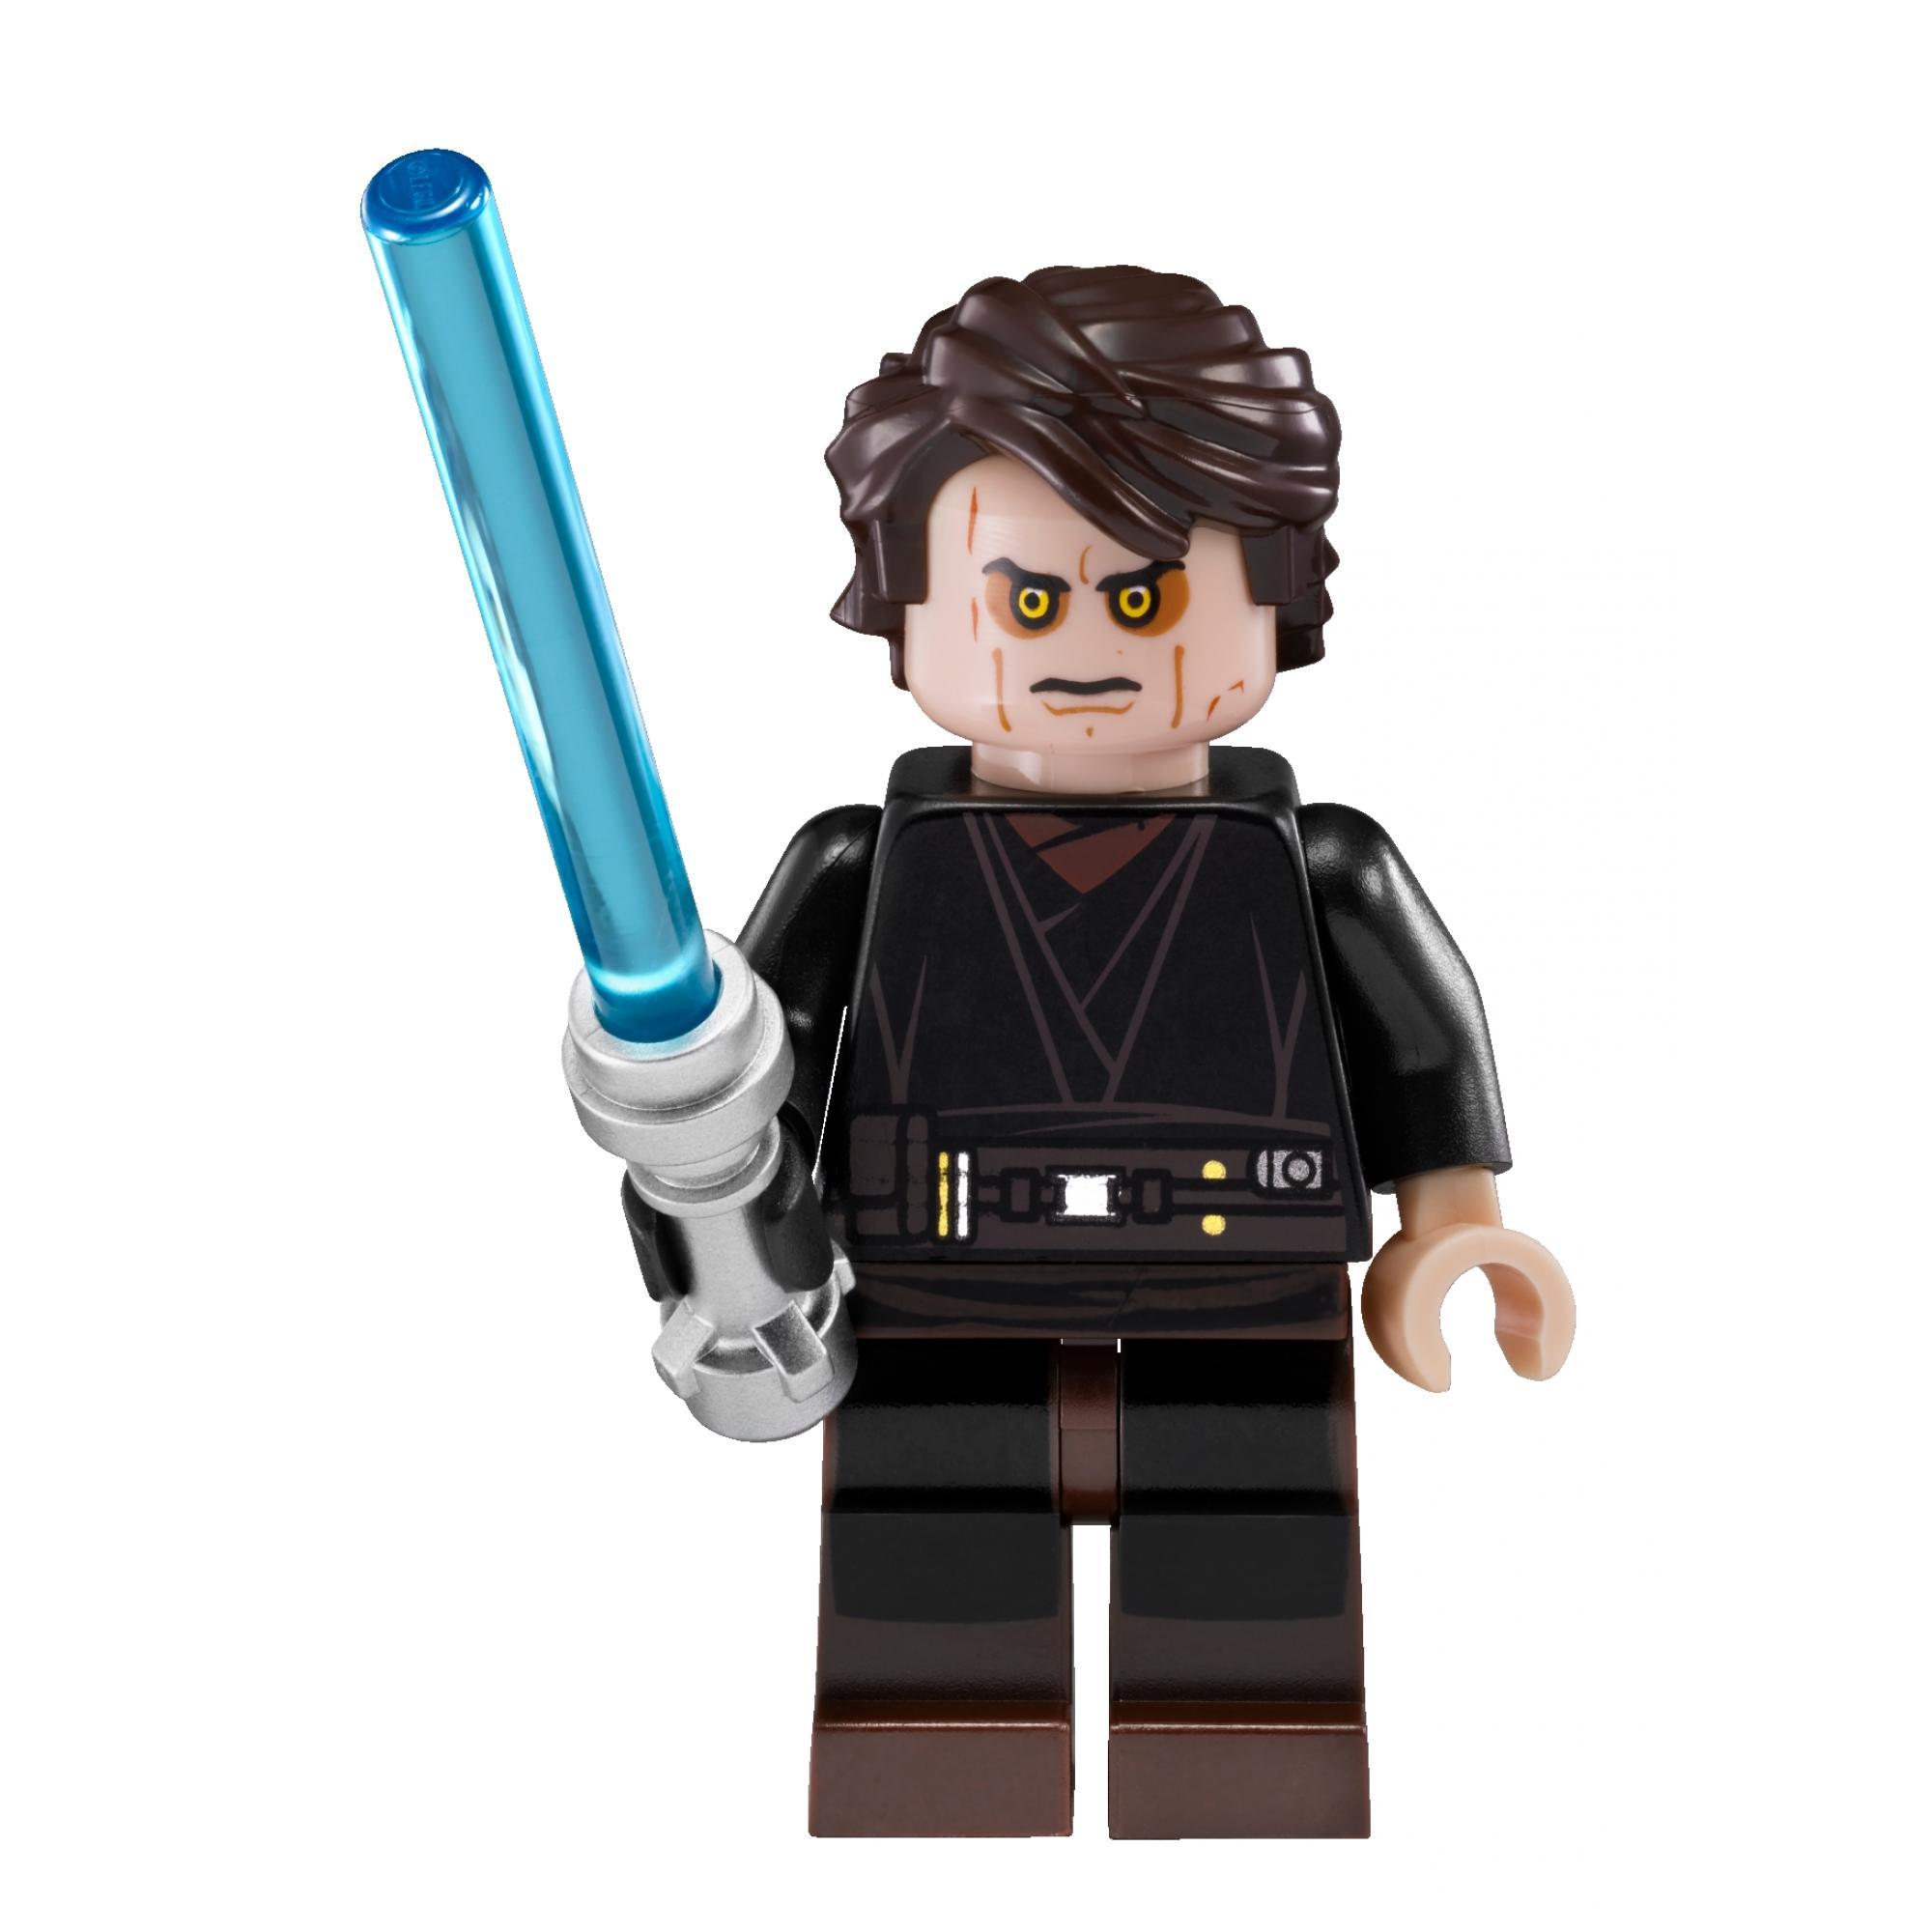 Anakin skywalker brickipedia the lego wiki - Lego star wars vaisseau anakin ...